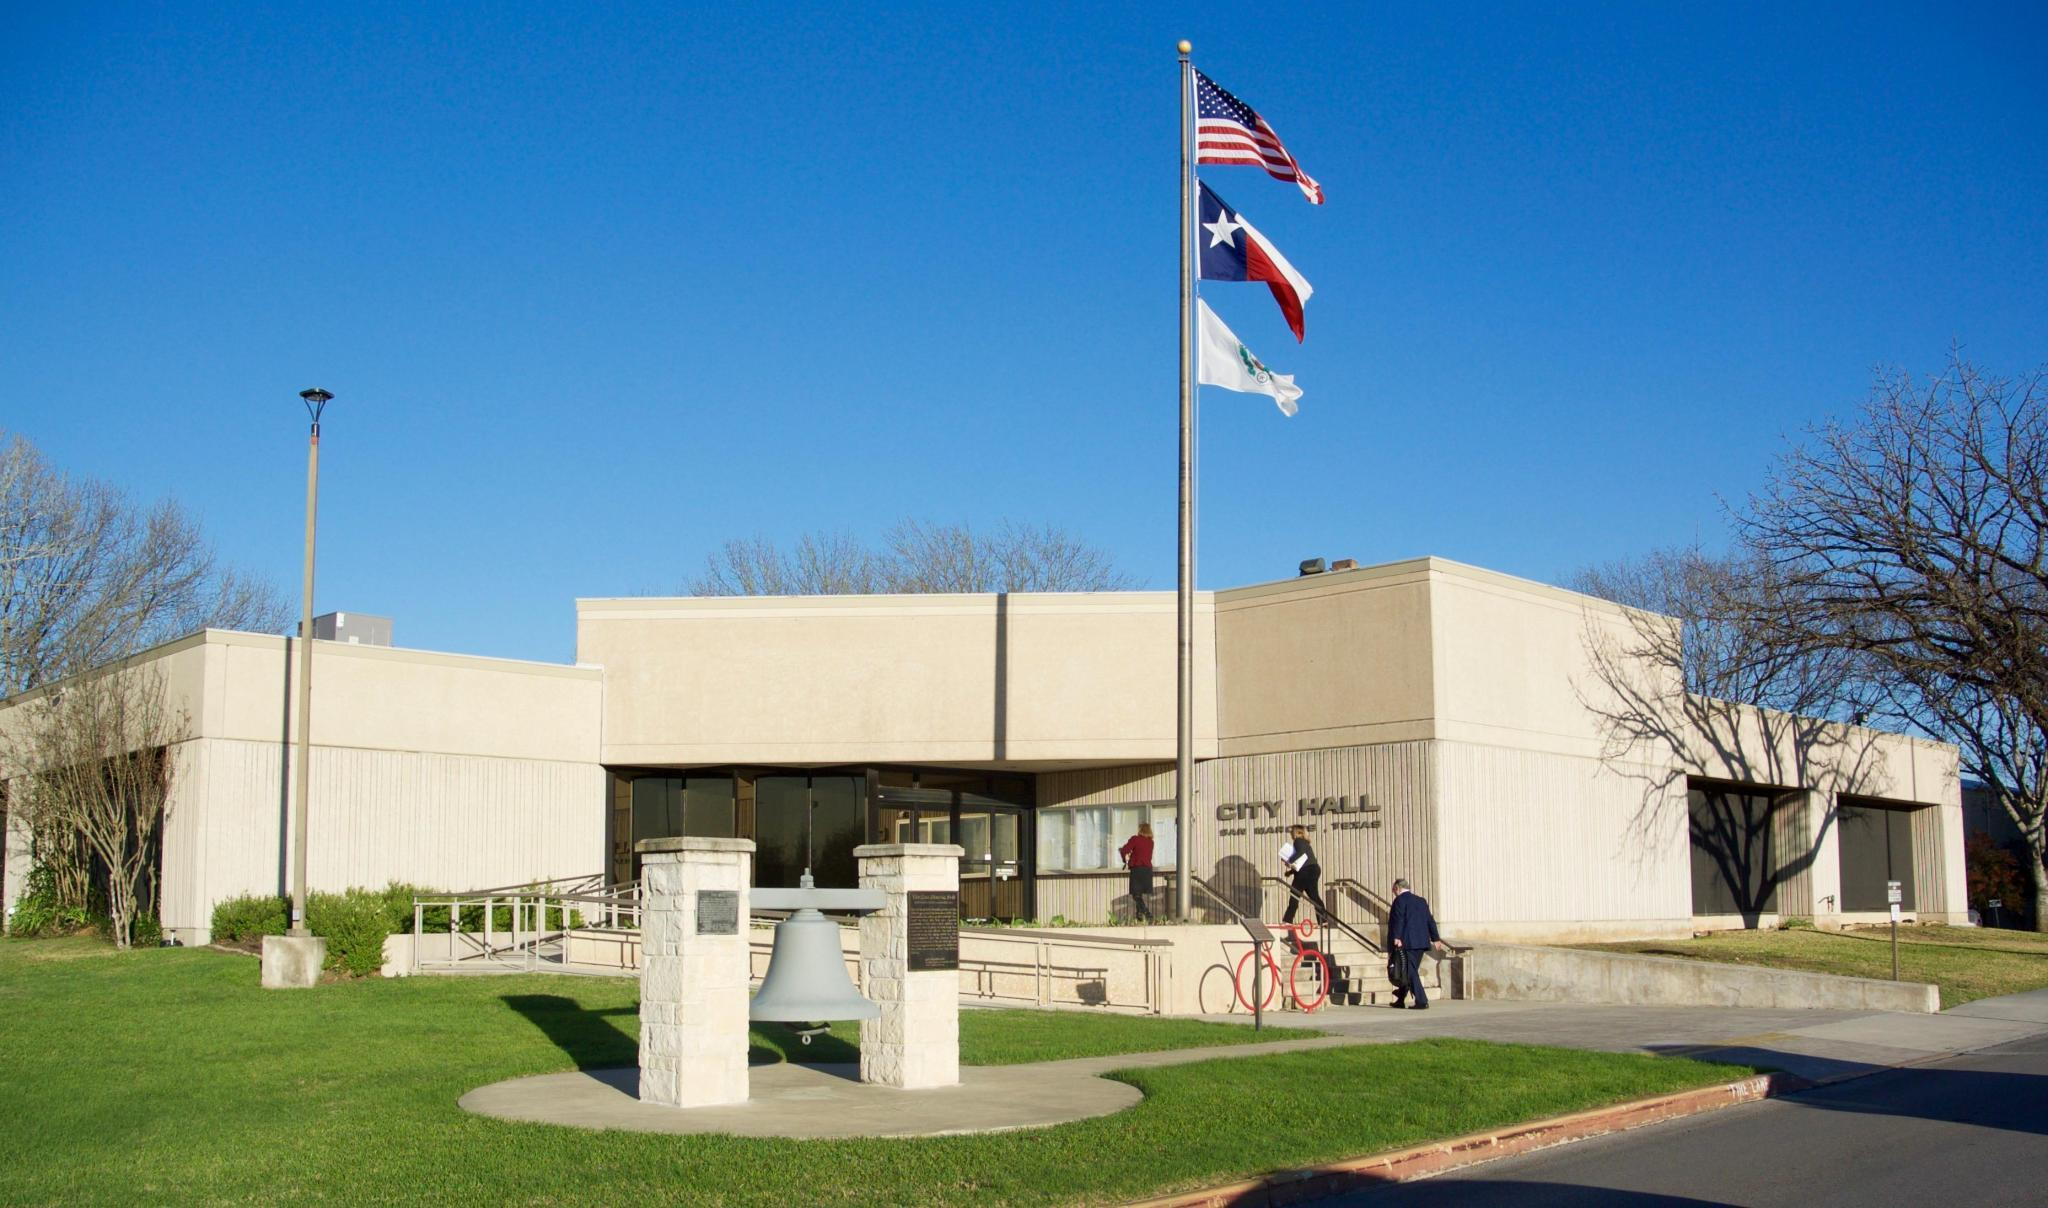 City of San Marcos, City Council, Amazon Warehouse